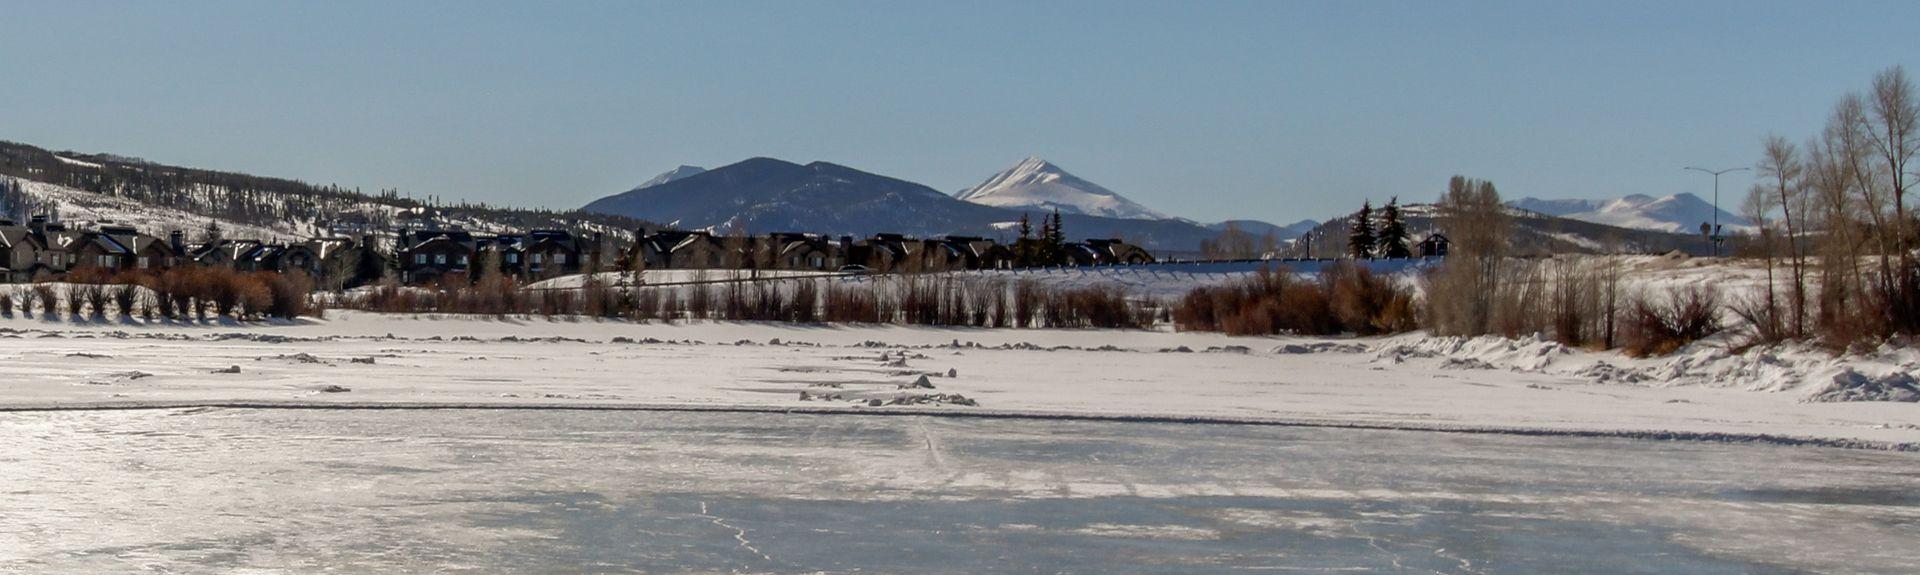 Three Peaks, Silverthorne, Colorado, Stati Uniti d'America